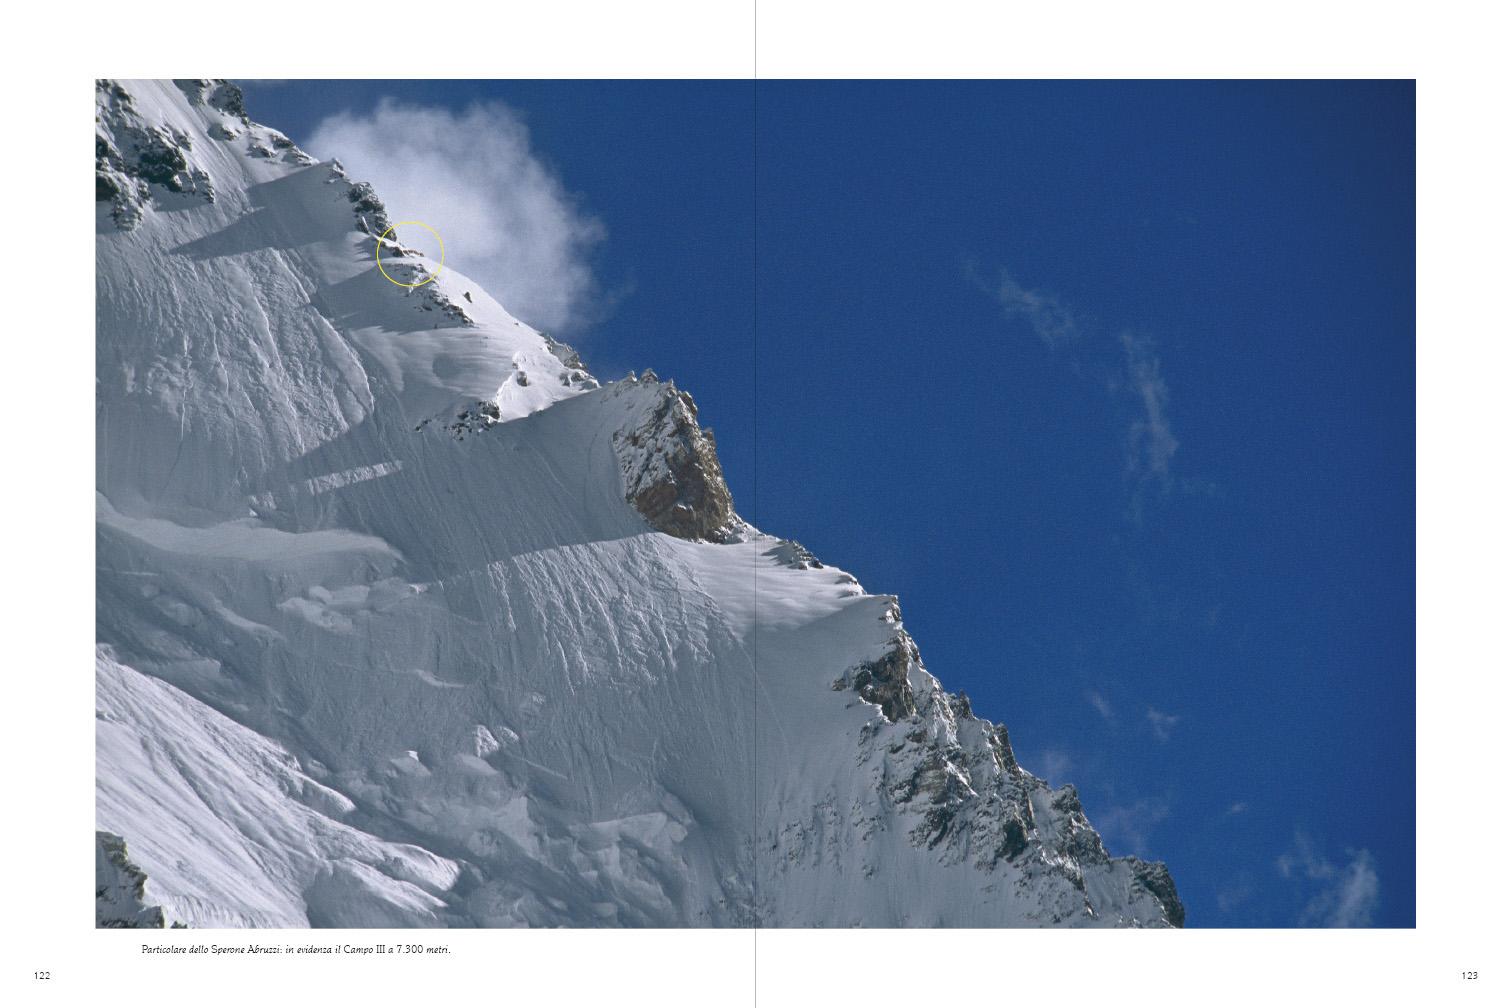 K2 EXPEDITION 1954-2004 Giuseppe Ghedina Fotografo - 063.jpg